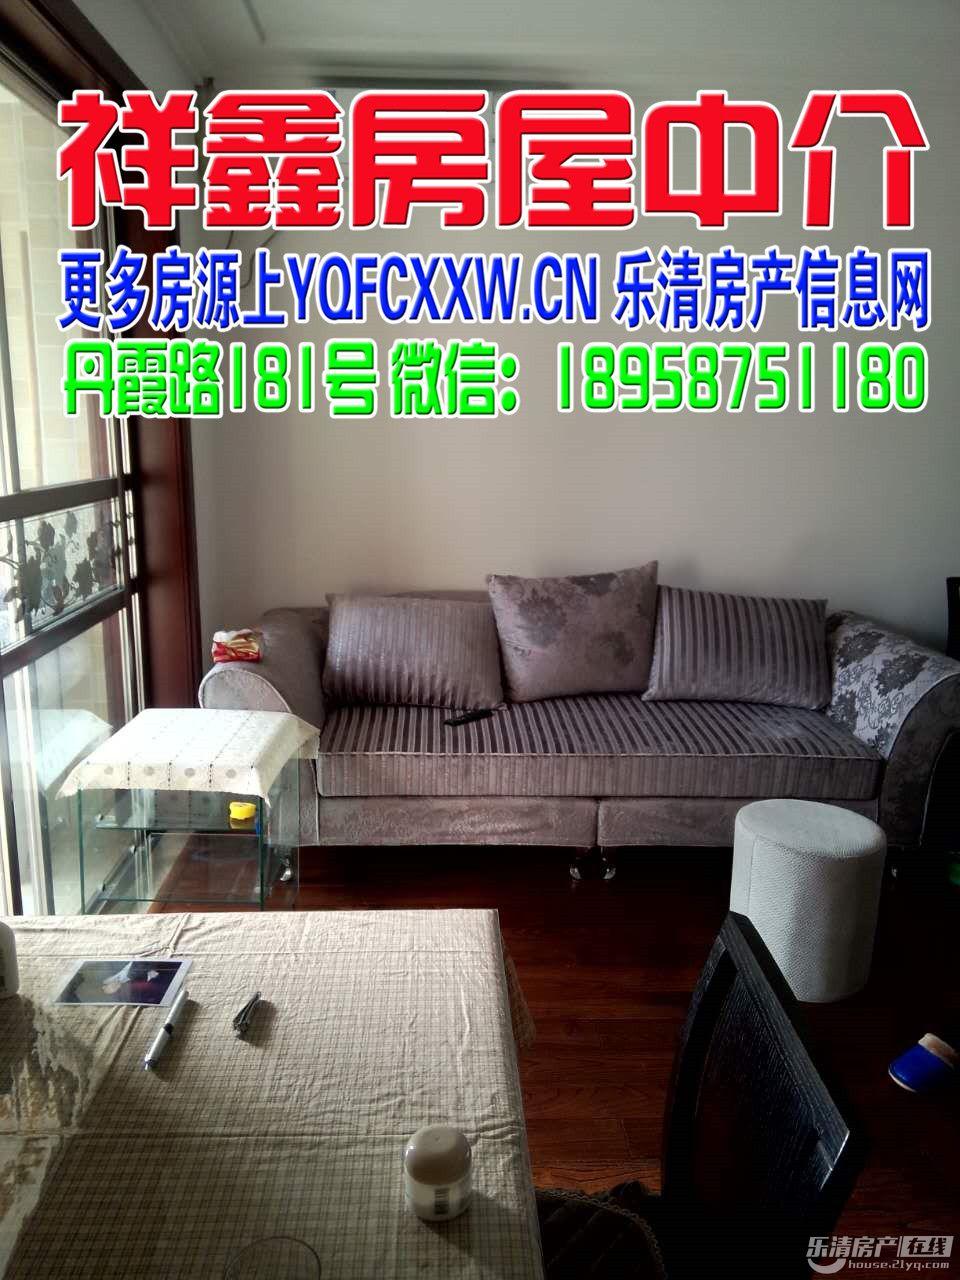 http://house.21yq.com/userfiles/image/20160630/30141148bc15688ad80828.jpg